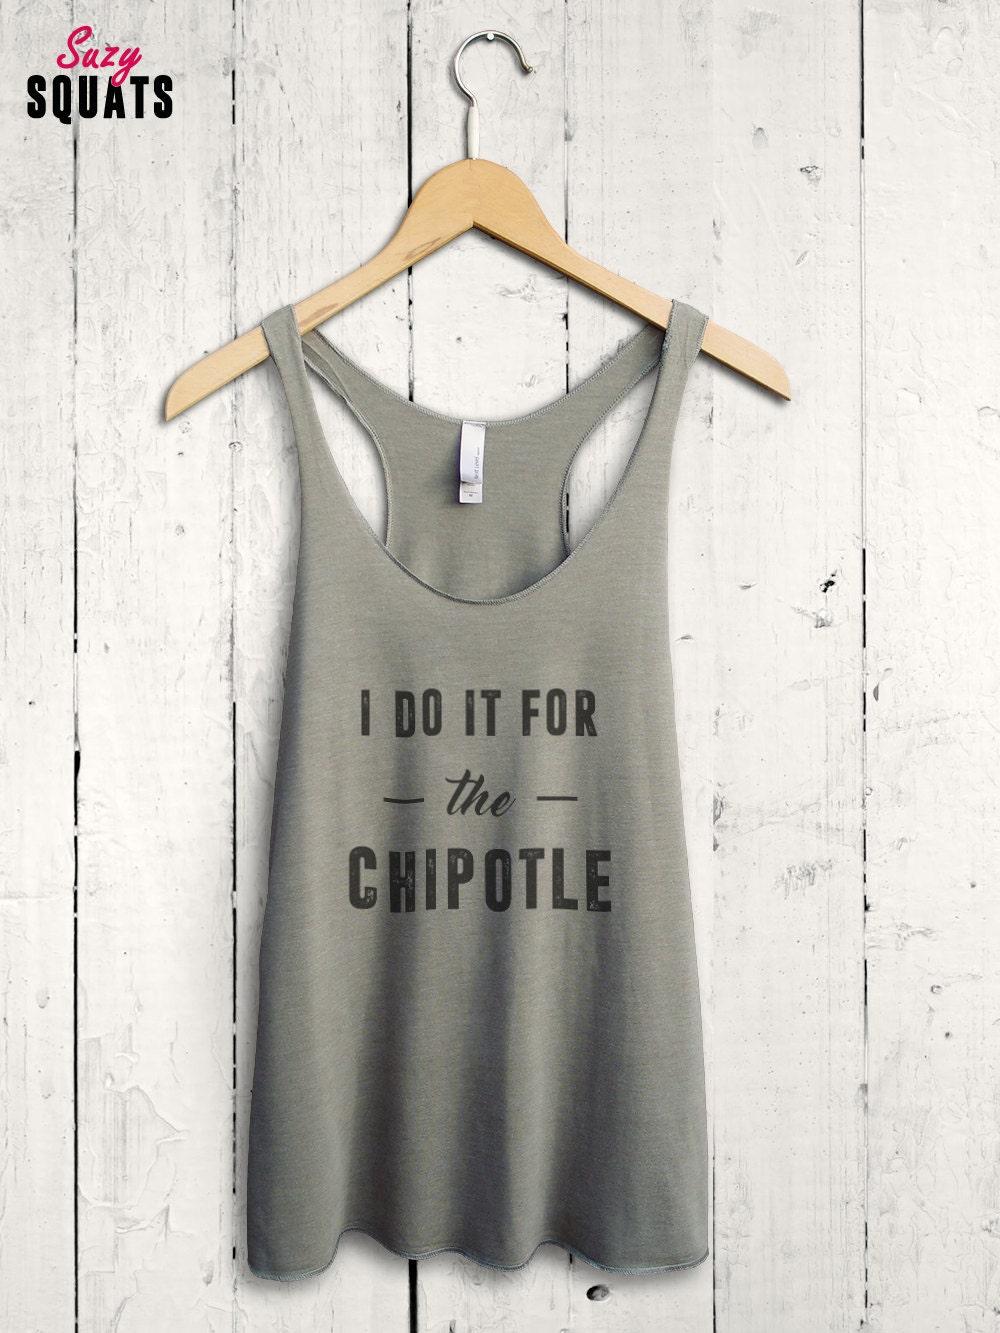 Funny chipotle shirt  Etsy